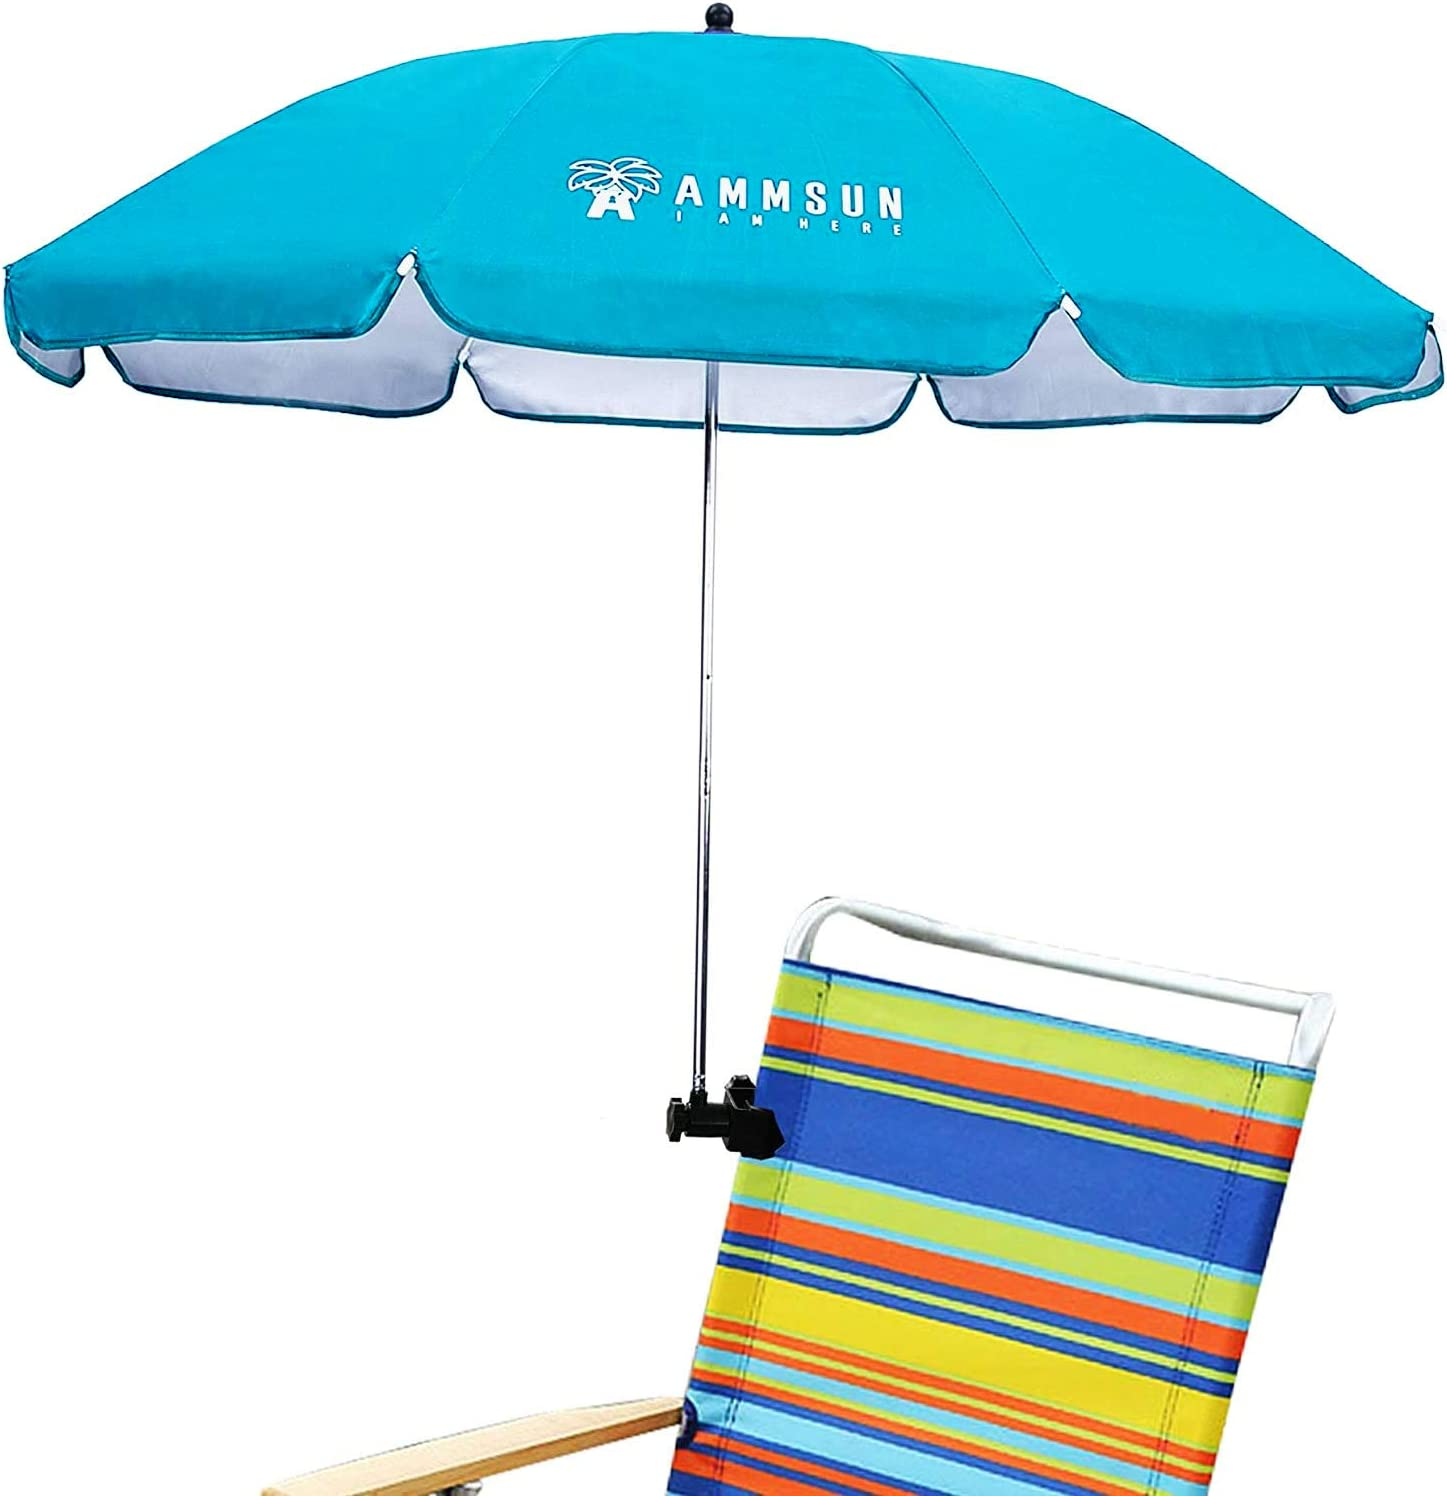 Best Beach Umbrella Australia - Sand anchor beach umbrella